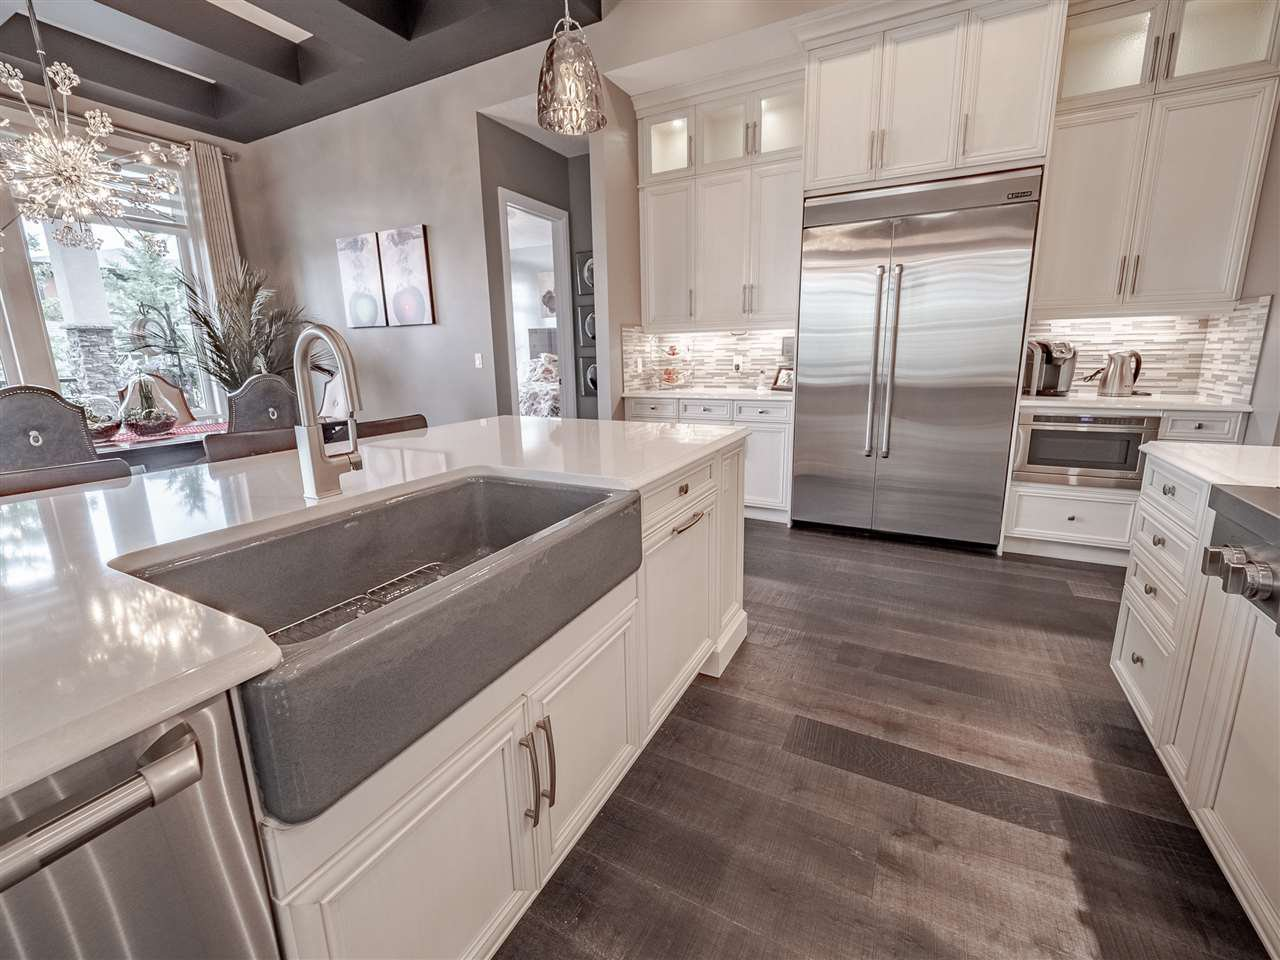 Photo 17: Photos: 58 Kenton Woods Lane NW: Spruce Grove House for sale : MLS®# E4166439